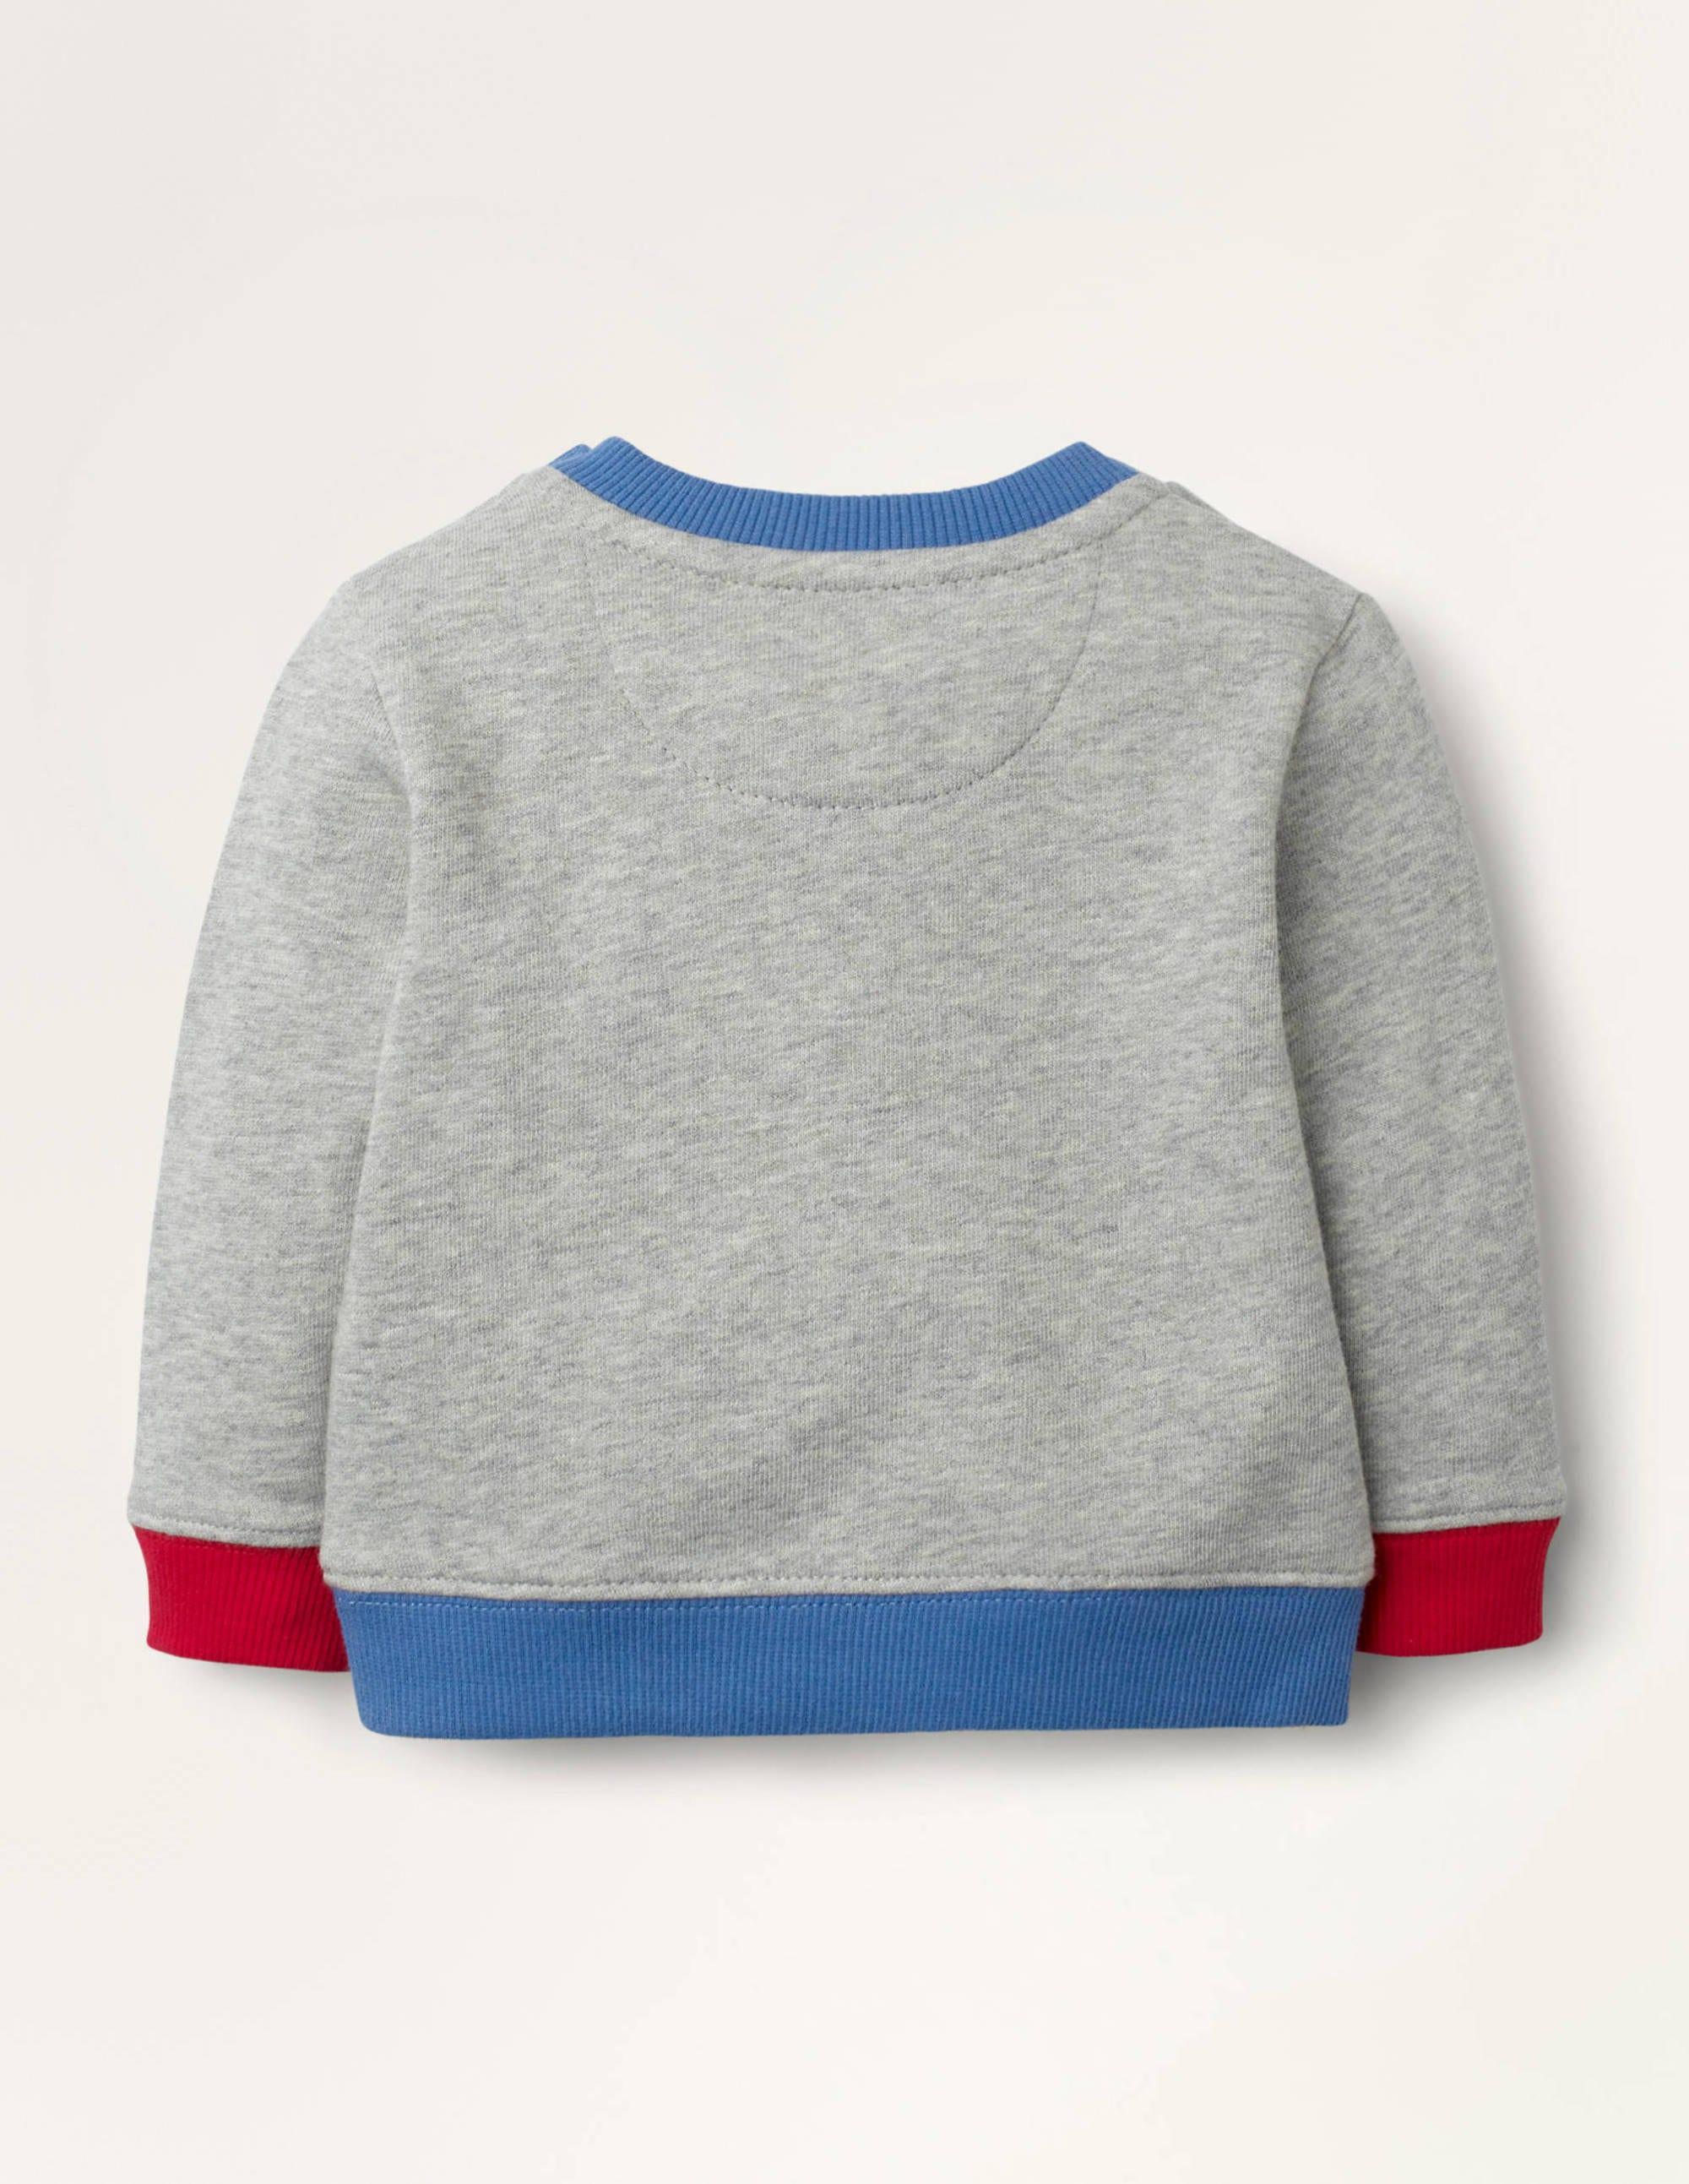 Sweatshirt Kleid Grau Meliert, Bouclé Punkte | Boden DE